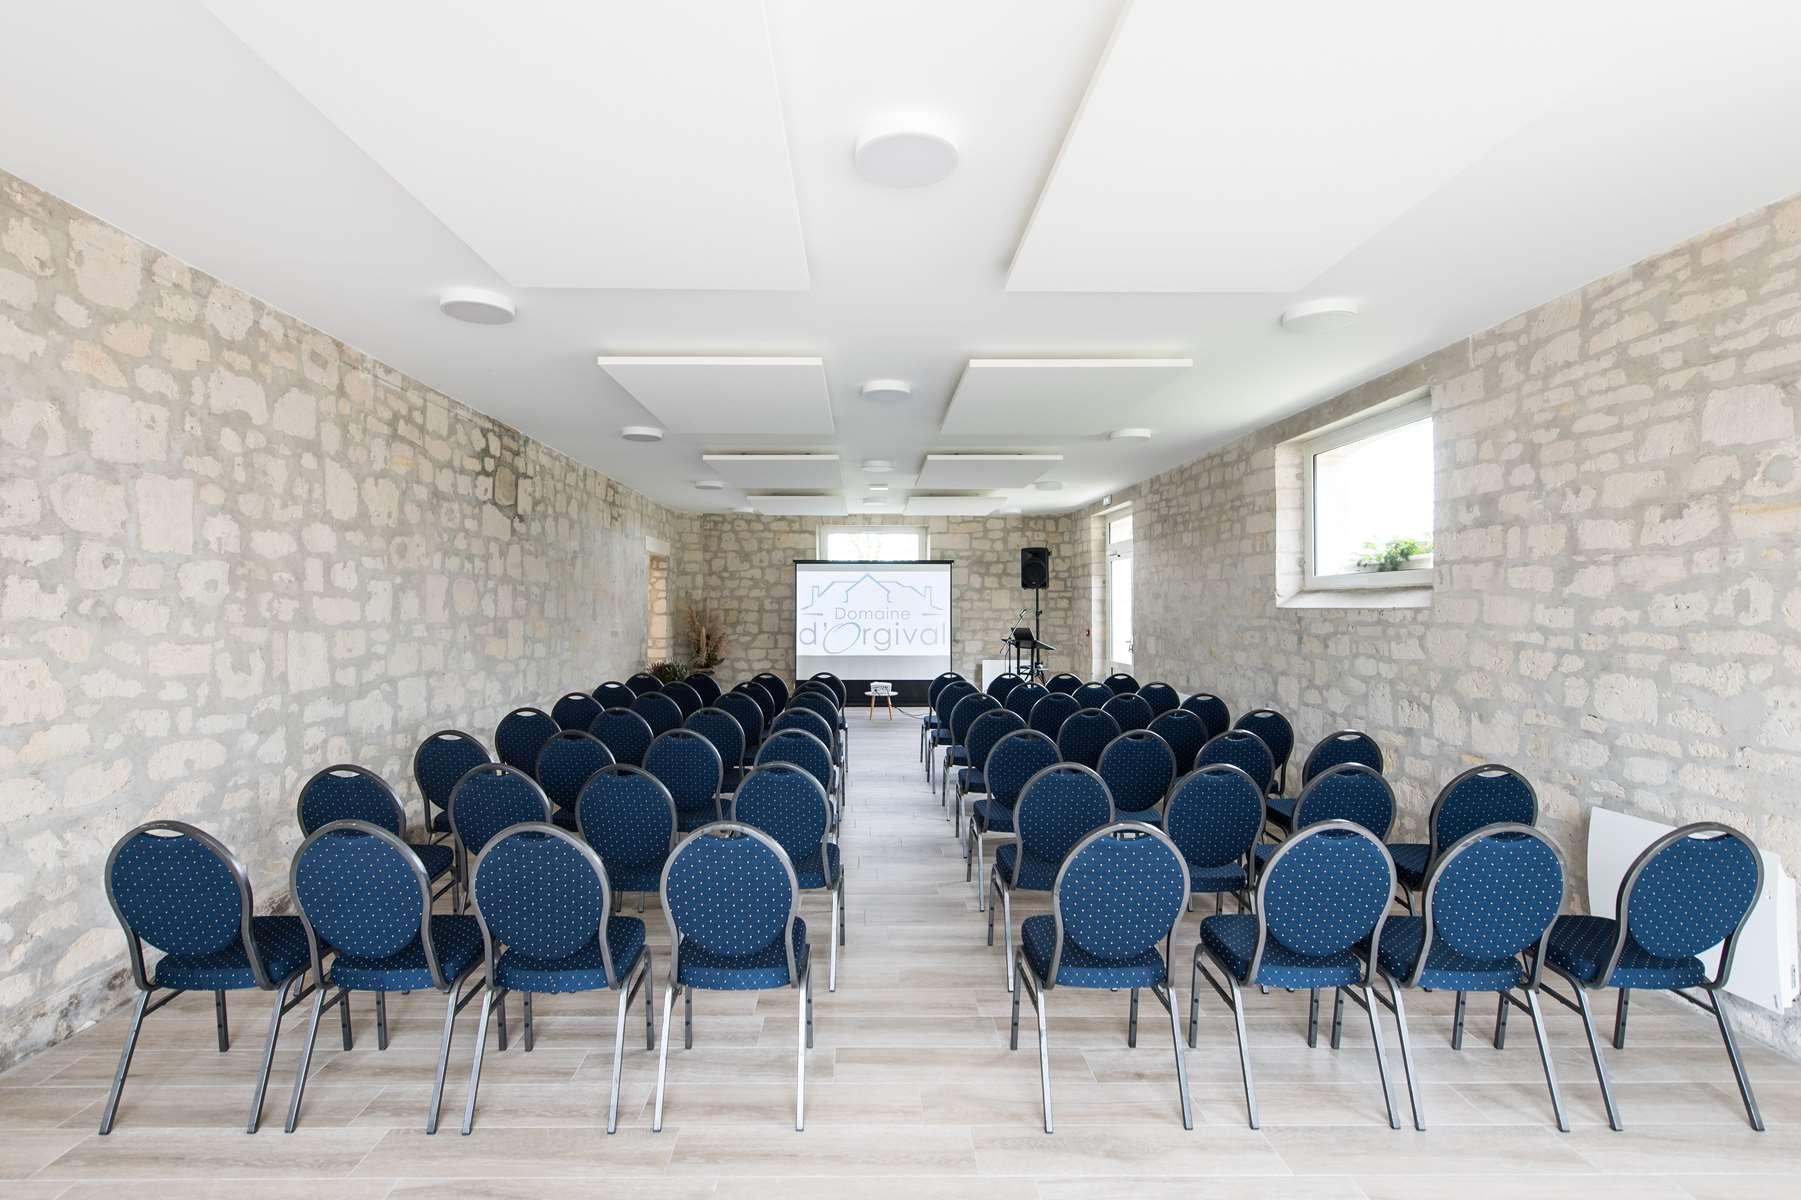 sonorisation réunion conférence